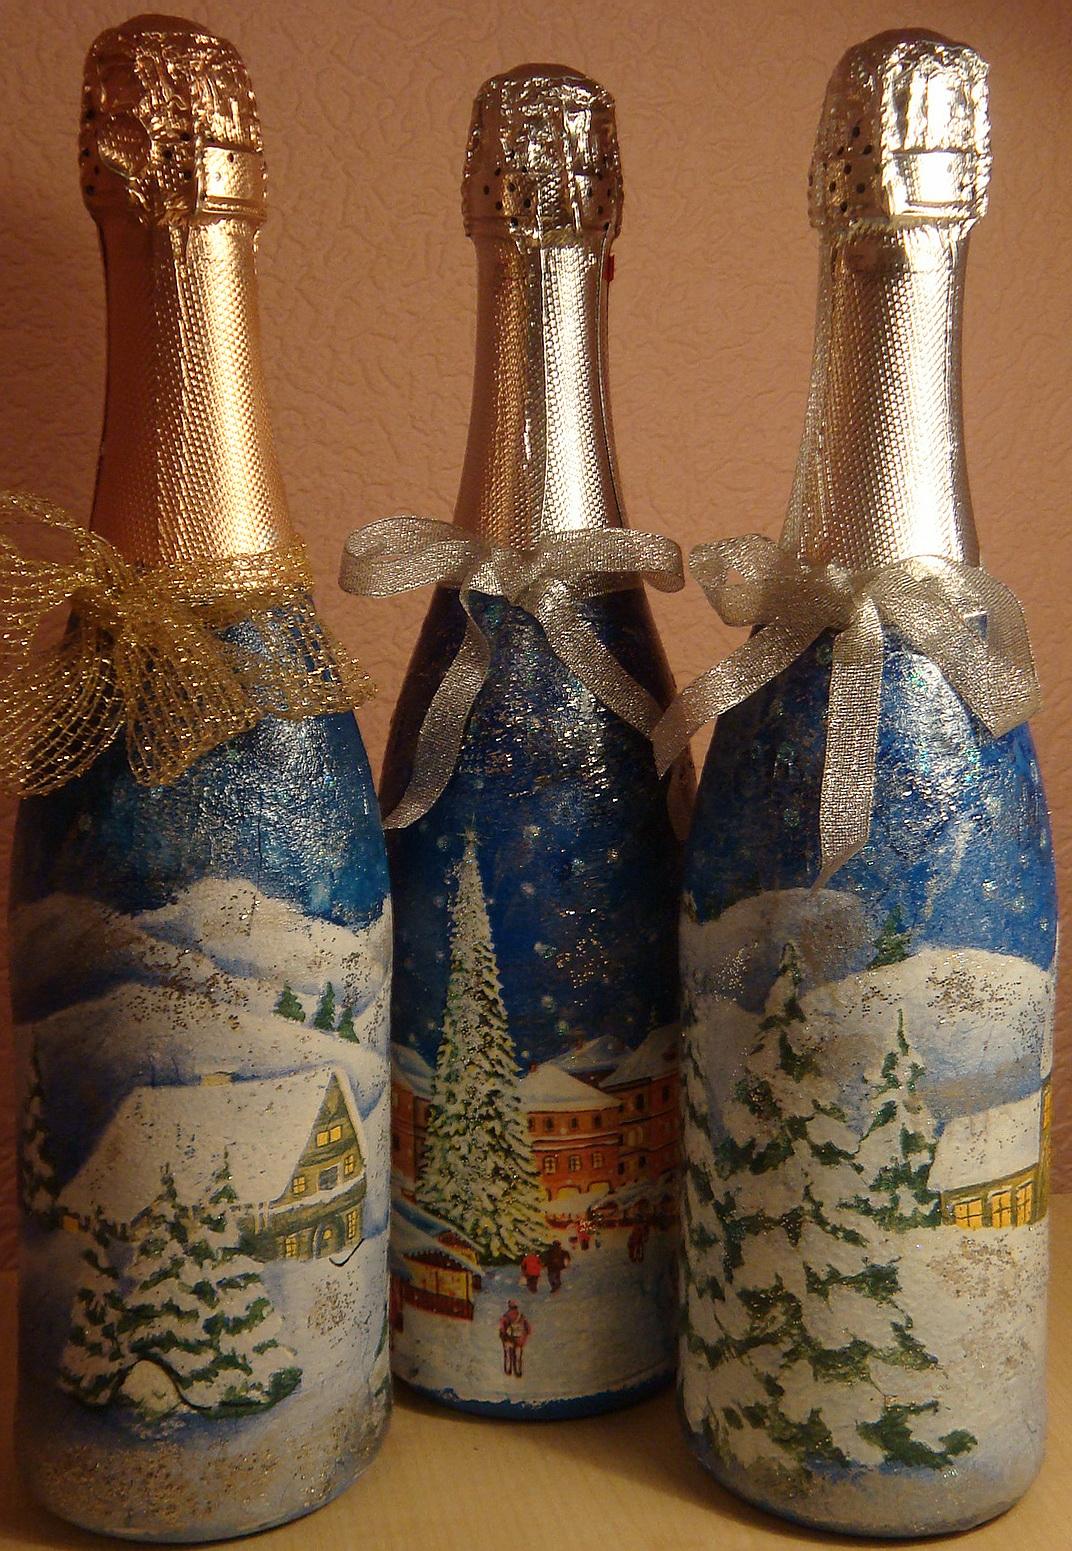 Фото бутылки банки в попе 15 фотография